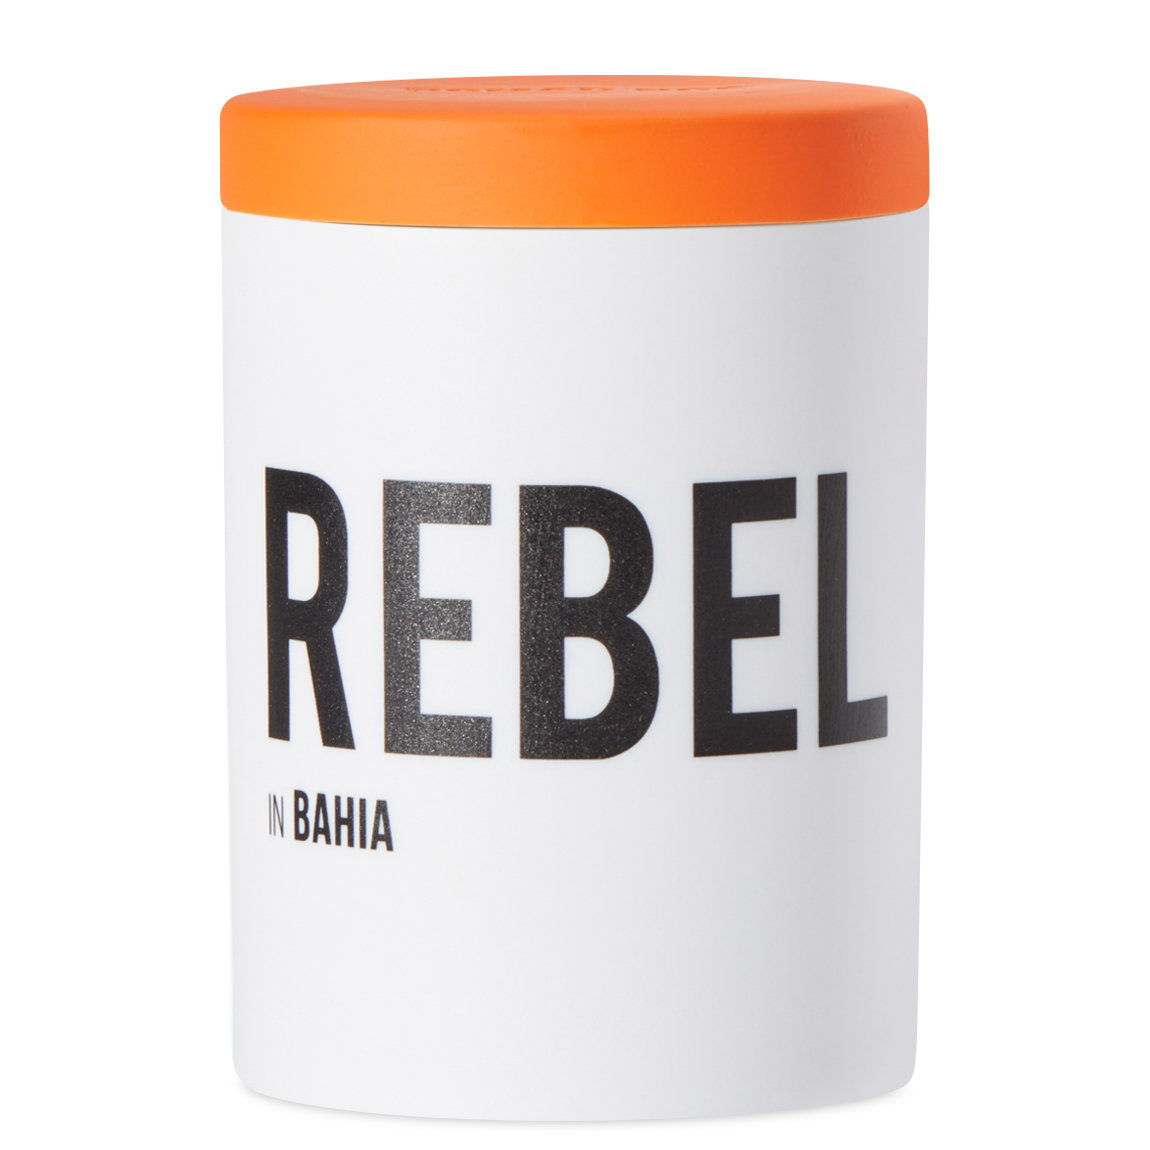 Nomad Noé Rebel In Bahia - Neroli & Incense Candle alternative view 1.